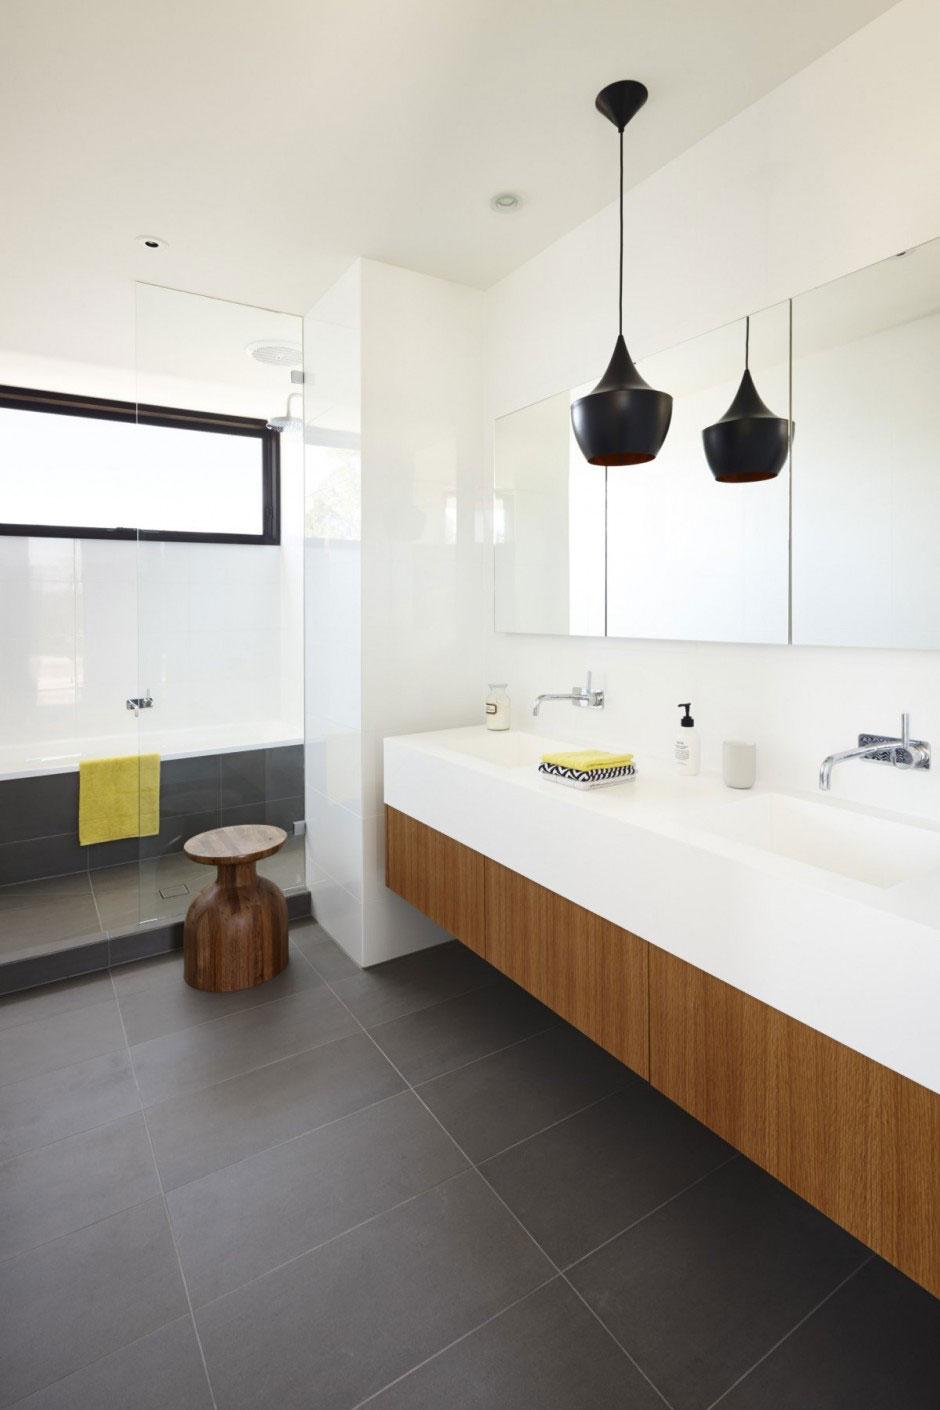 Bathroom Interior Inspiration-5 Bathroom Interior Inspiration You Can't Get enough of